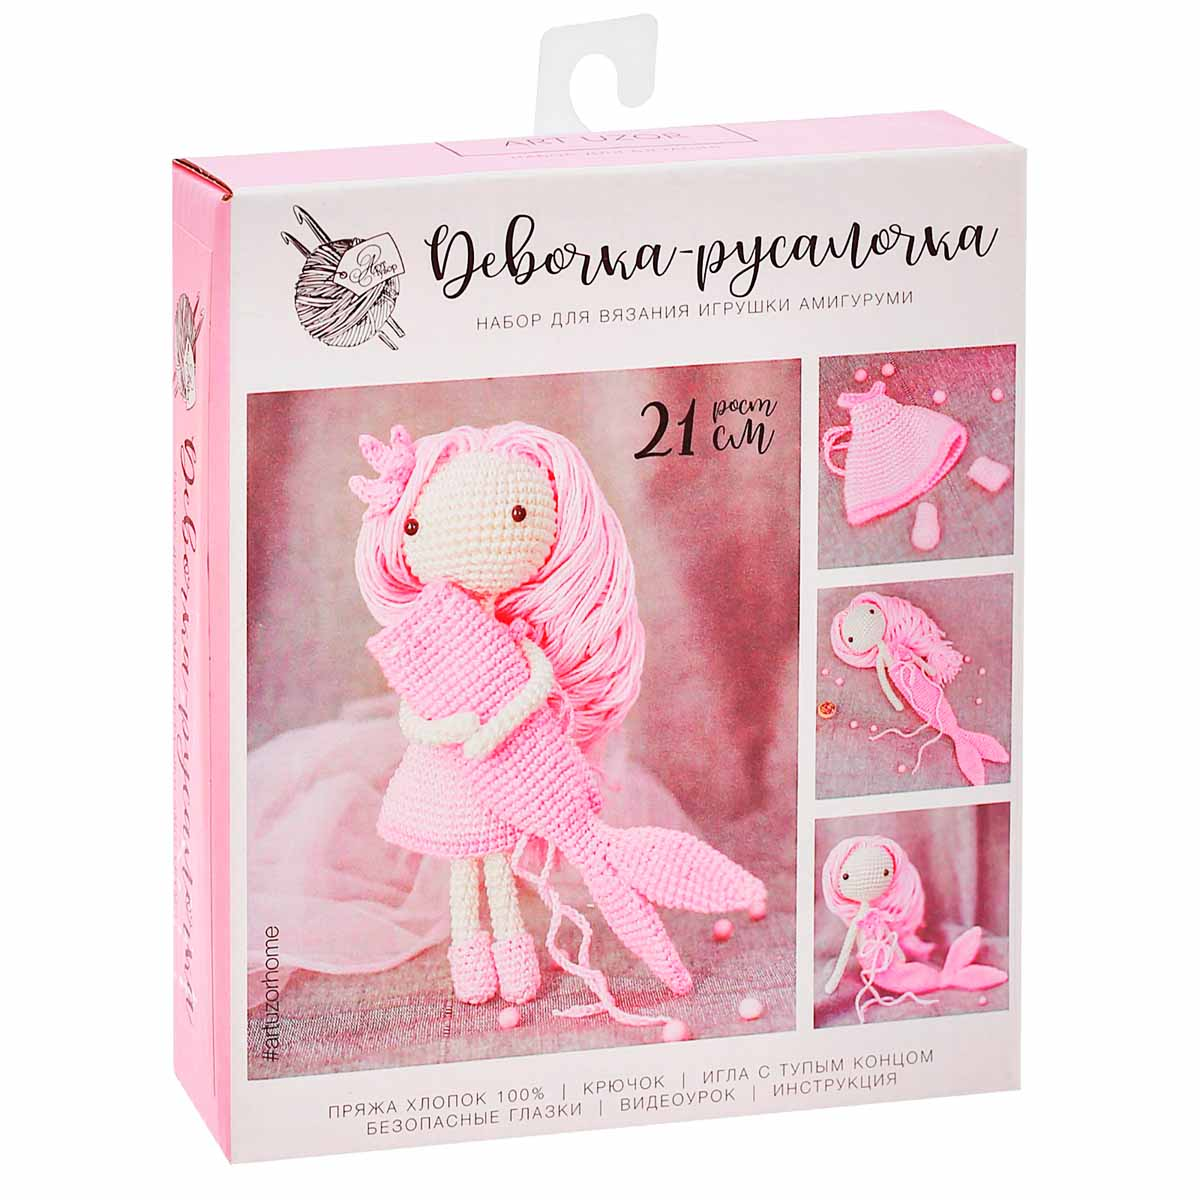 2724108 Амигуруми: Мягкая игрушка «Девочка Русалочка», набор для вязания, 10*4*14 см